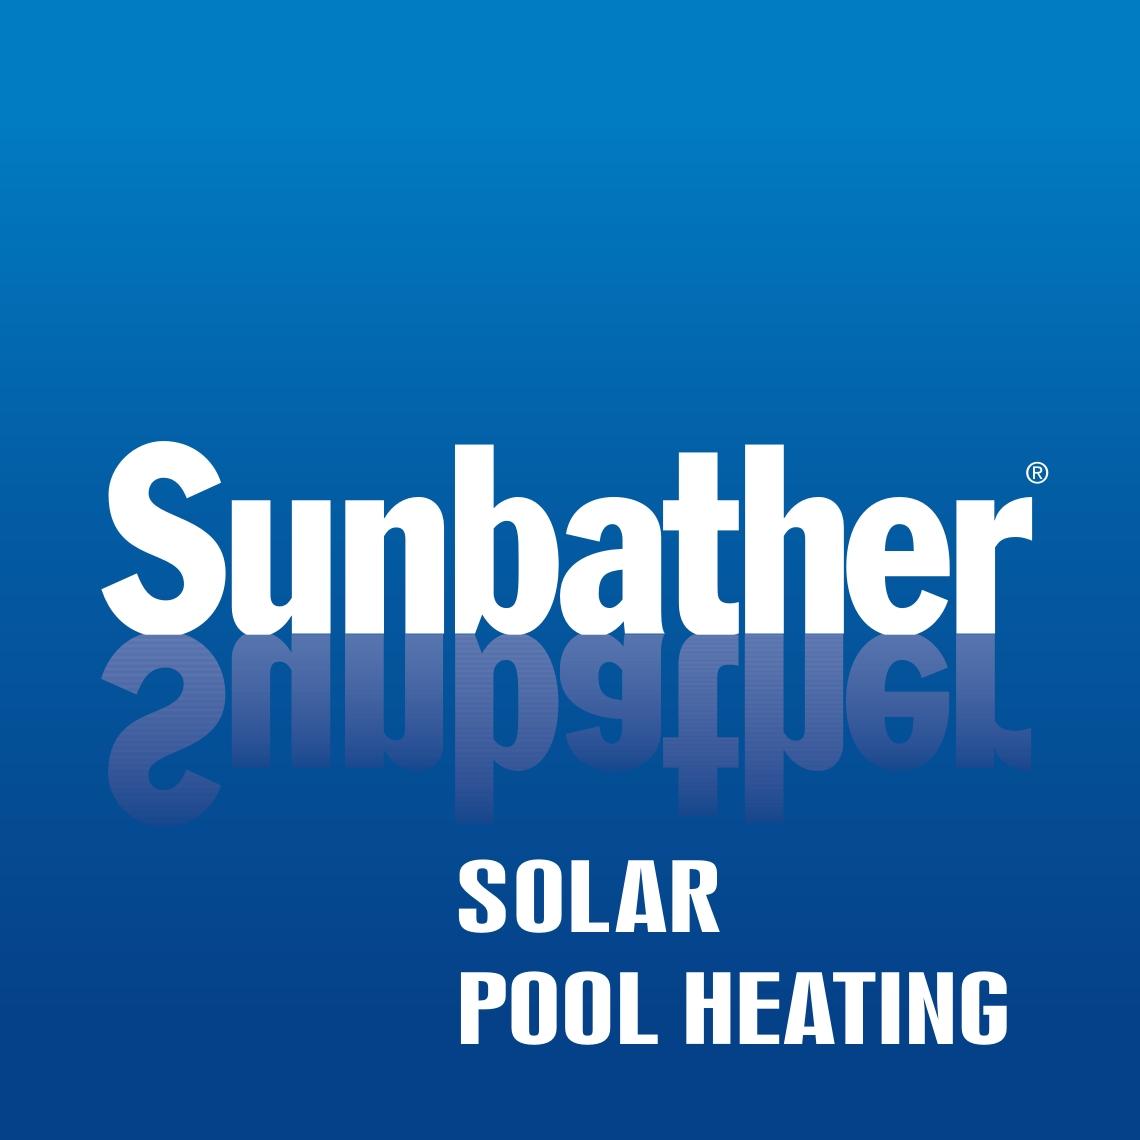 Sunbather Solar Pool Heating